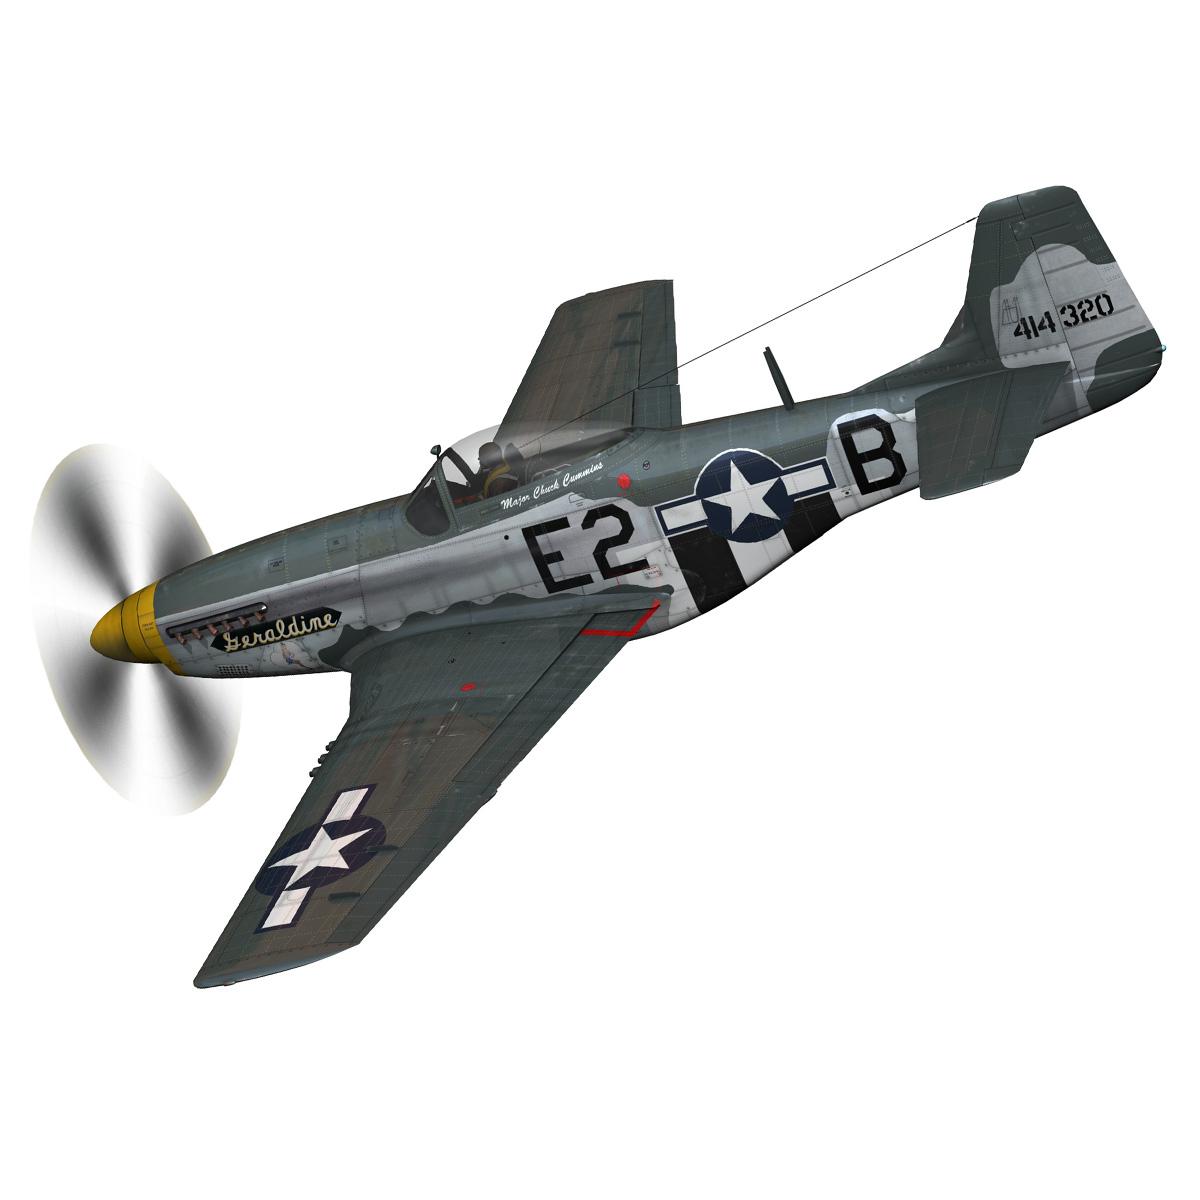 North American P-51D - Geraldine 3d model fbx c4d lwo obj 265941